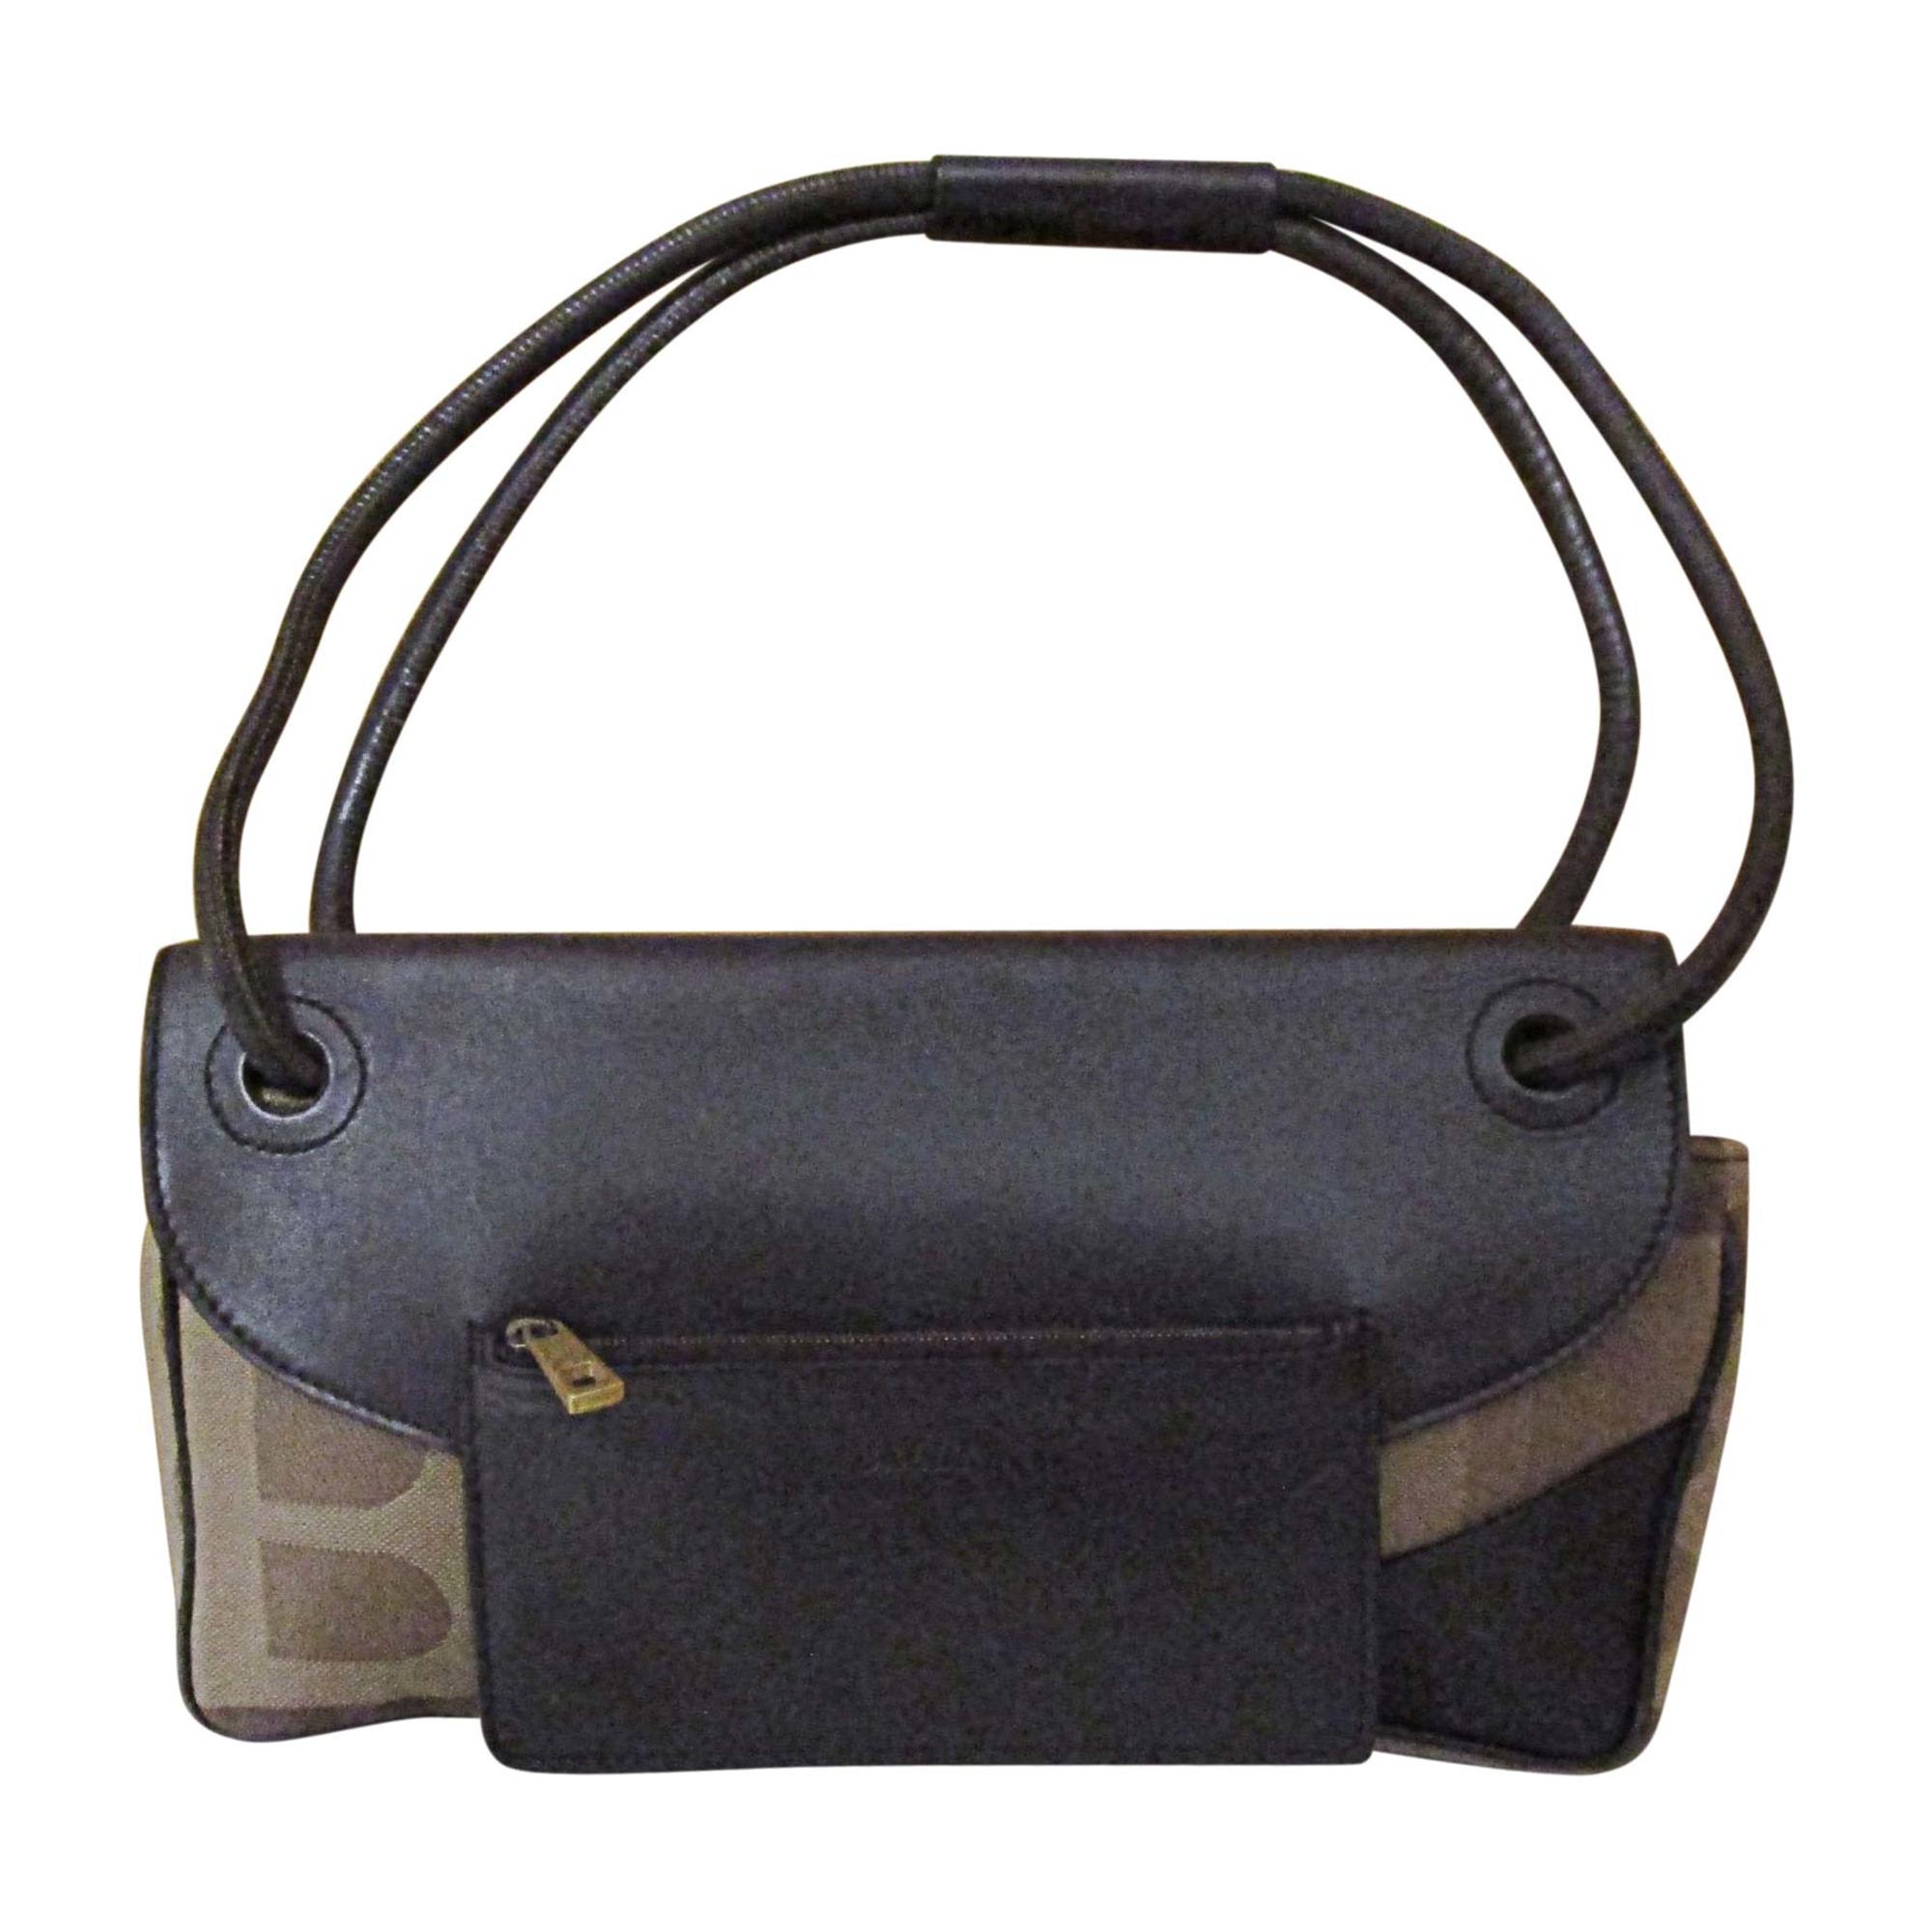 Lederhandtasche BALLY Mehrfarbig